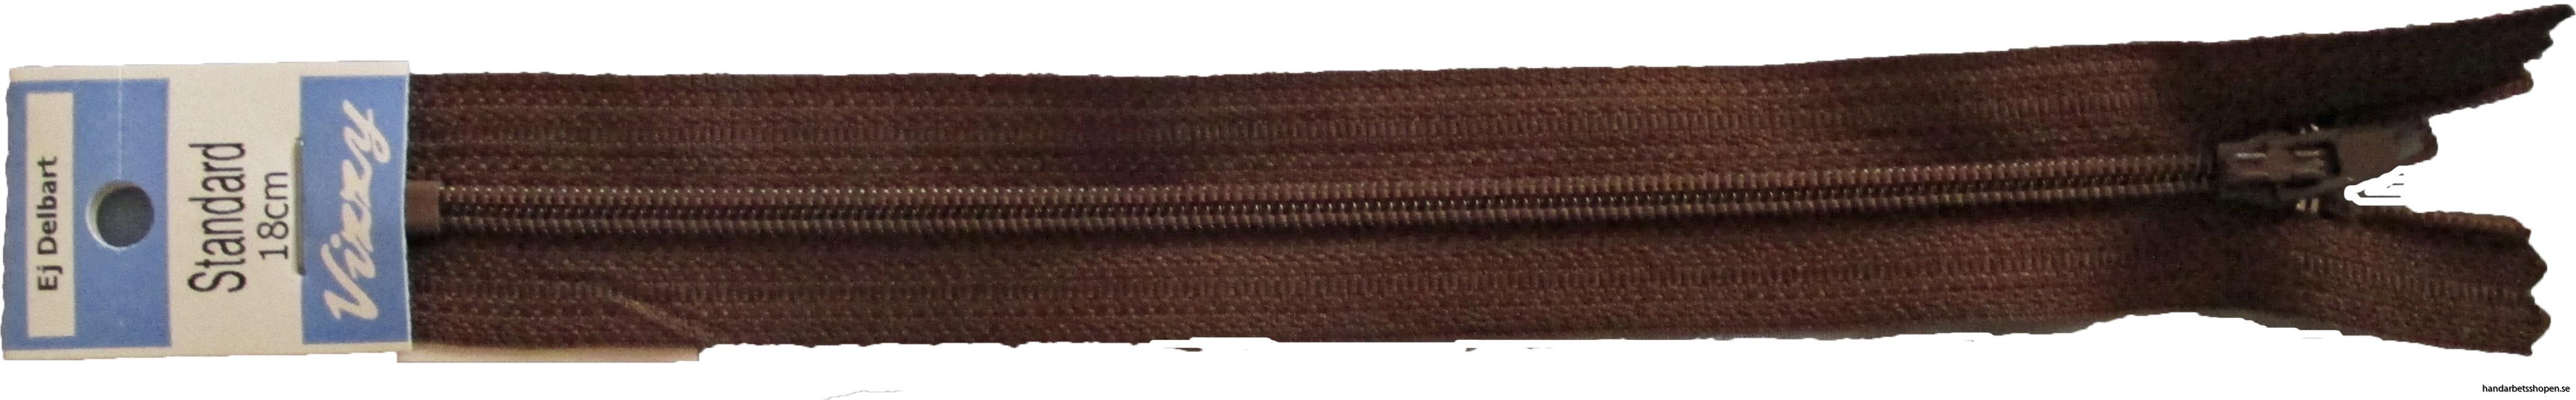 Bllixtlås 18 mm brun